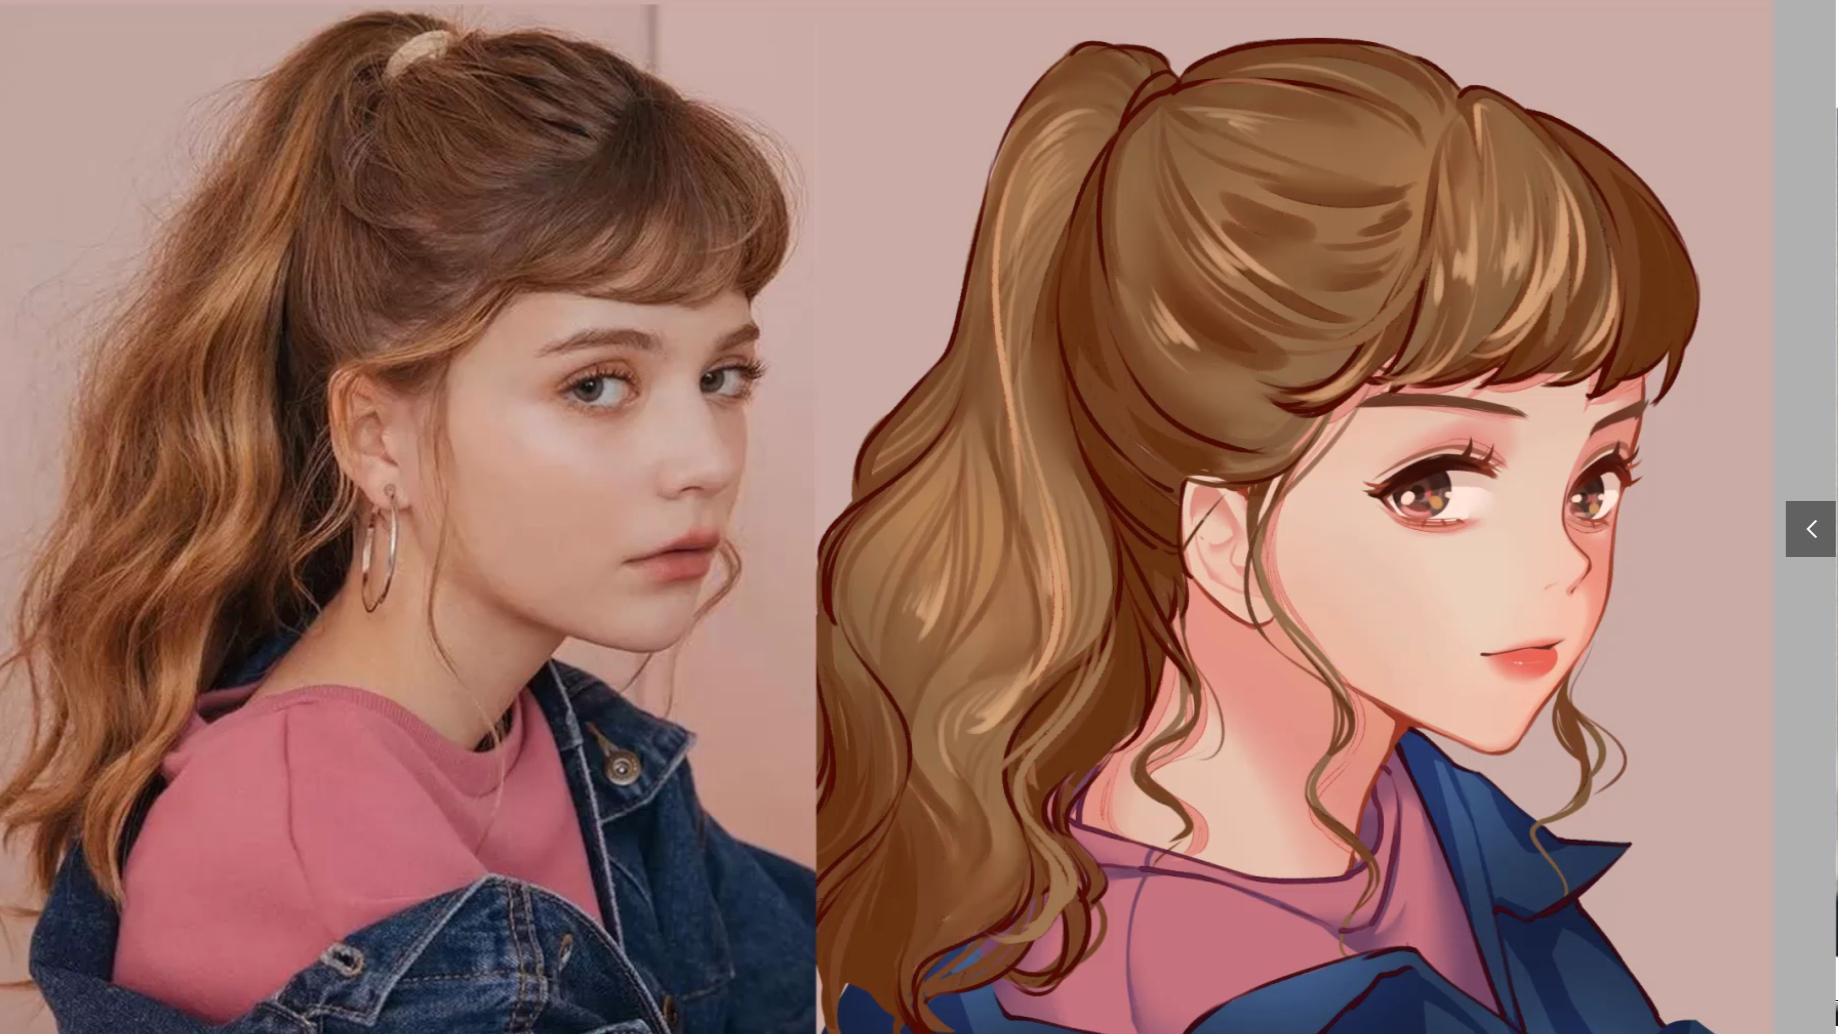 【PS绘画】教你如何绘画漂亮的小姐姐,从线稿到上色到厚涂#赛璐璐